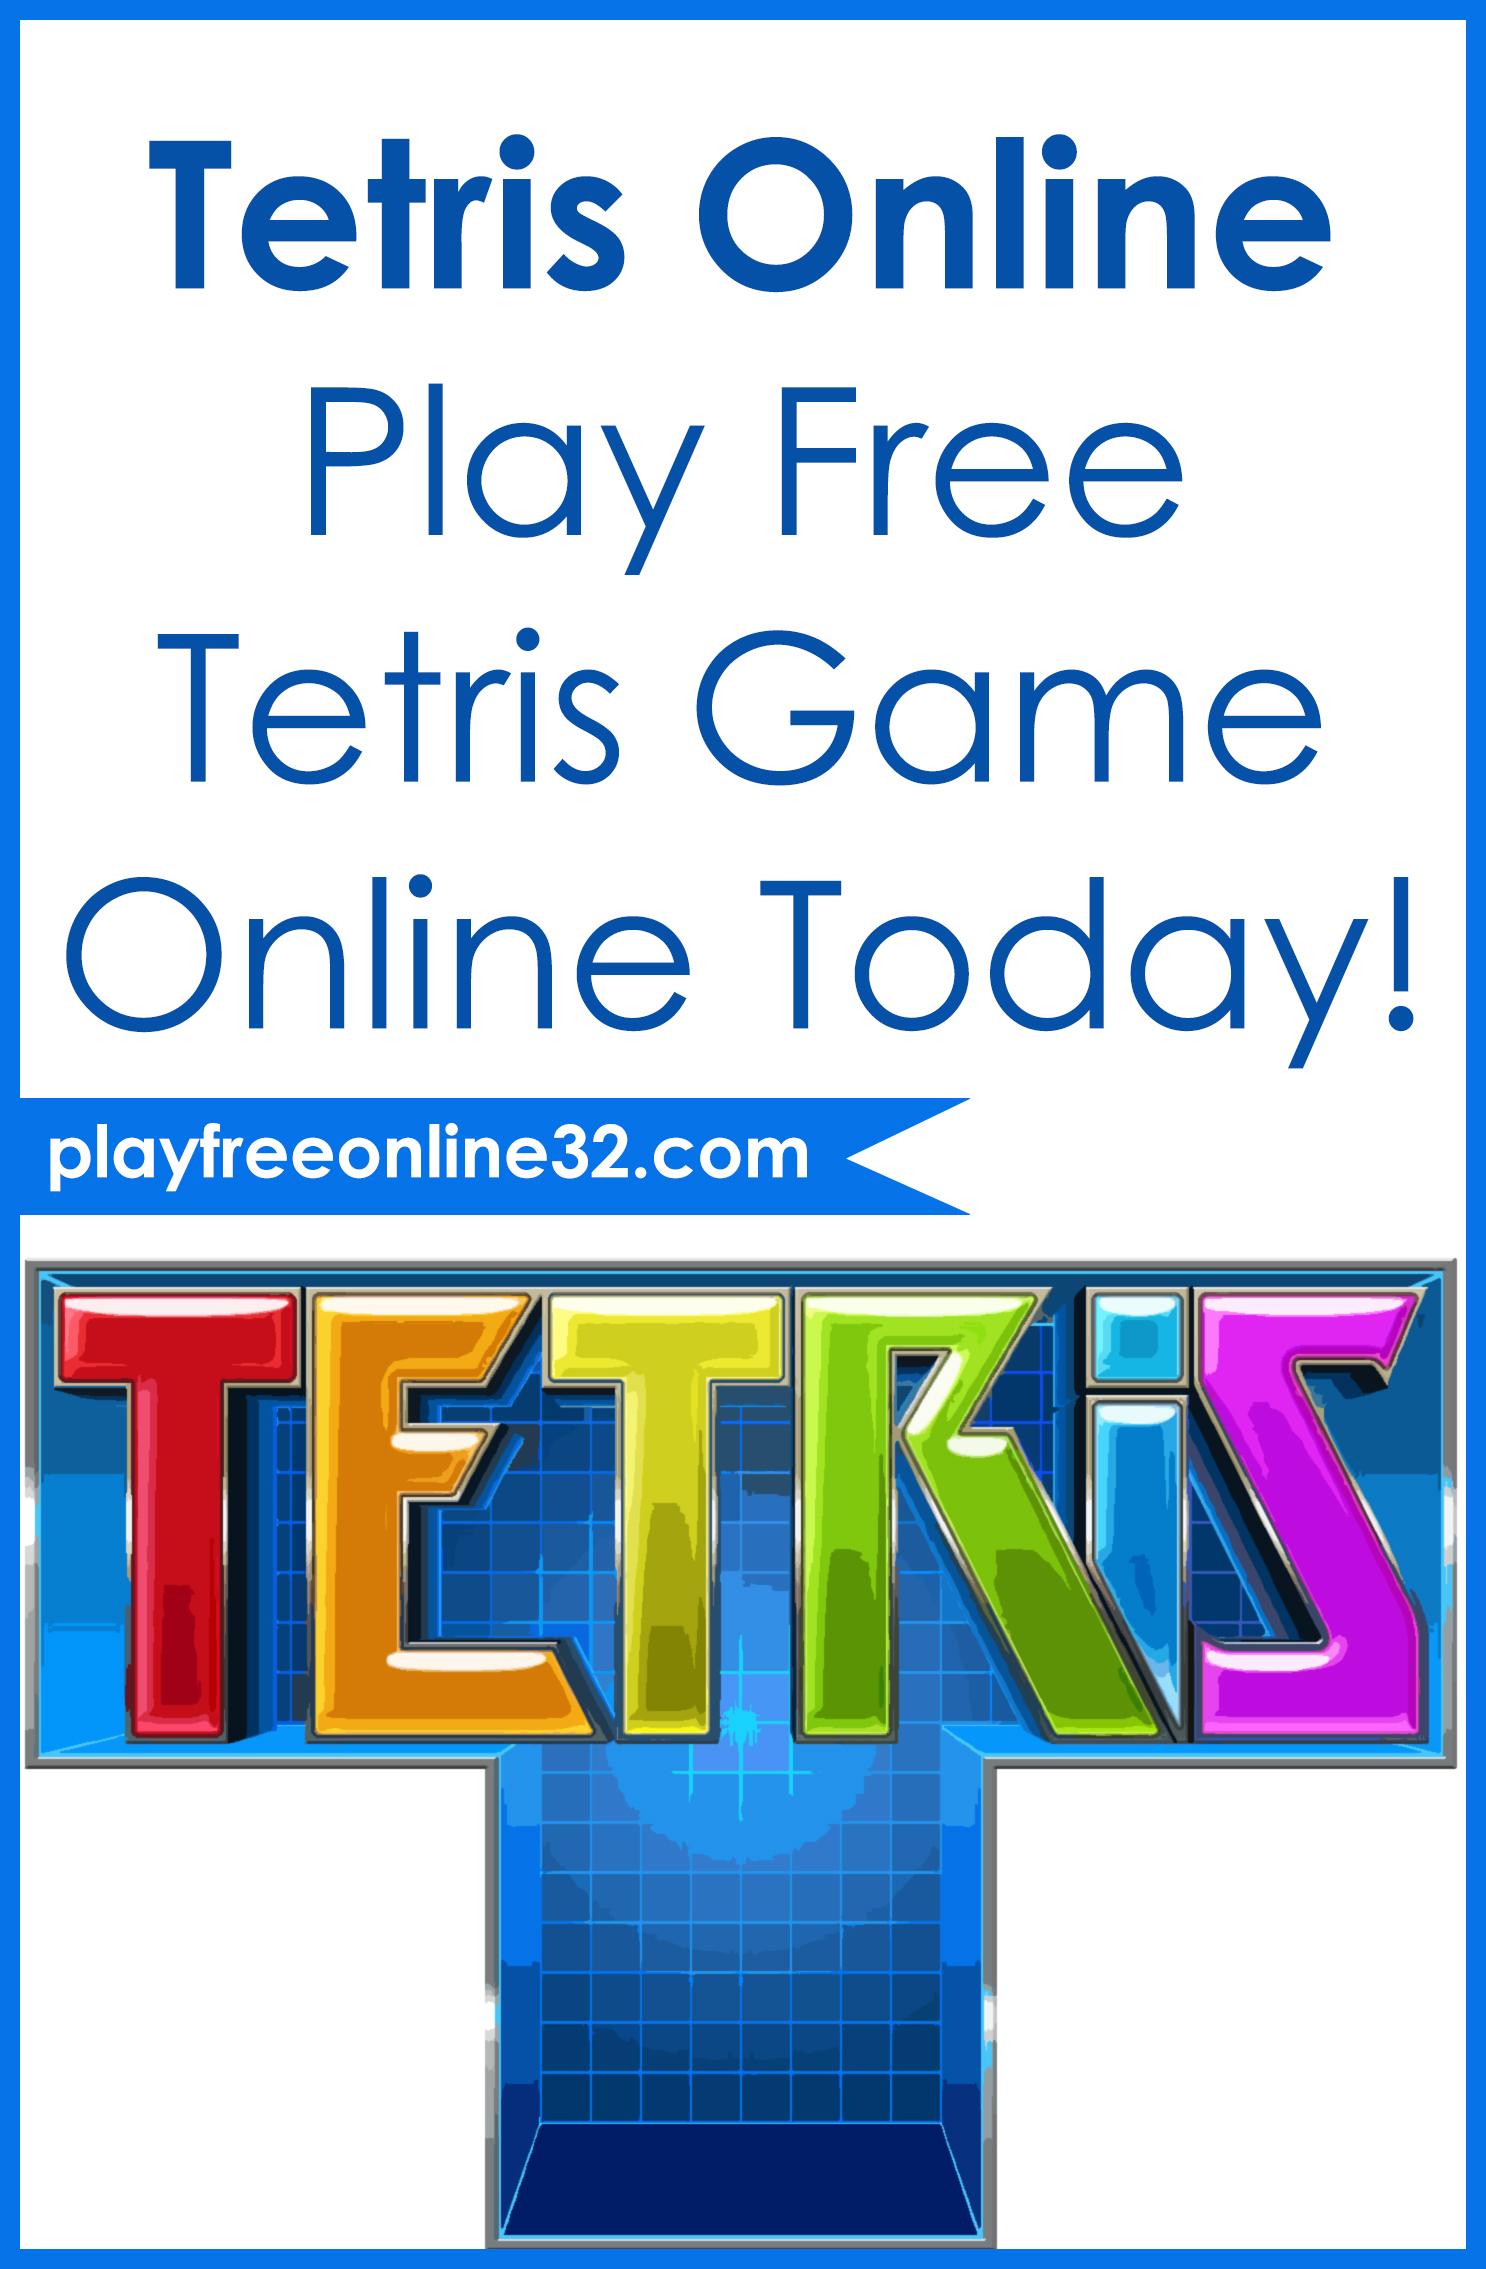 Tetris Online • Play Free Tetris Game Online Today!